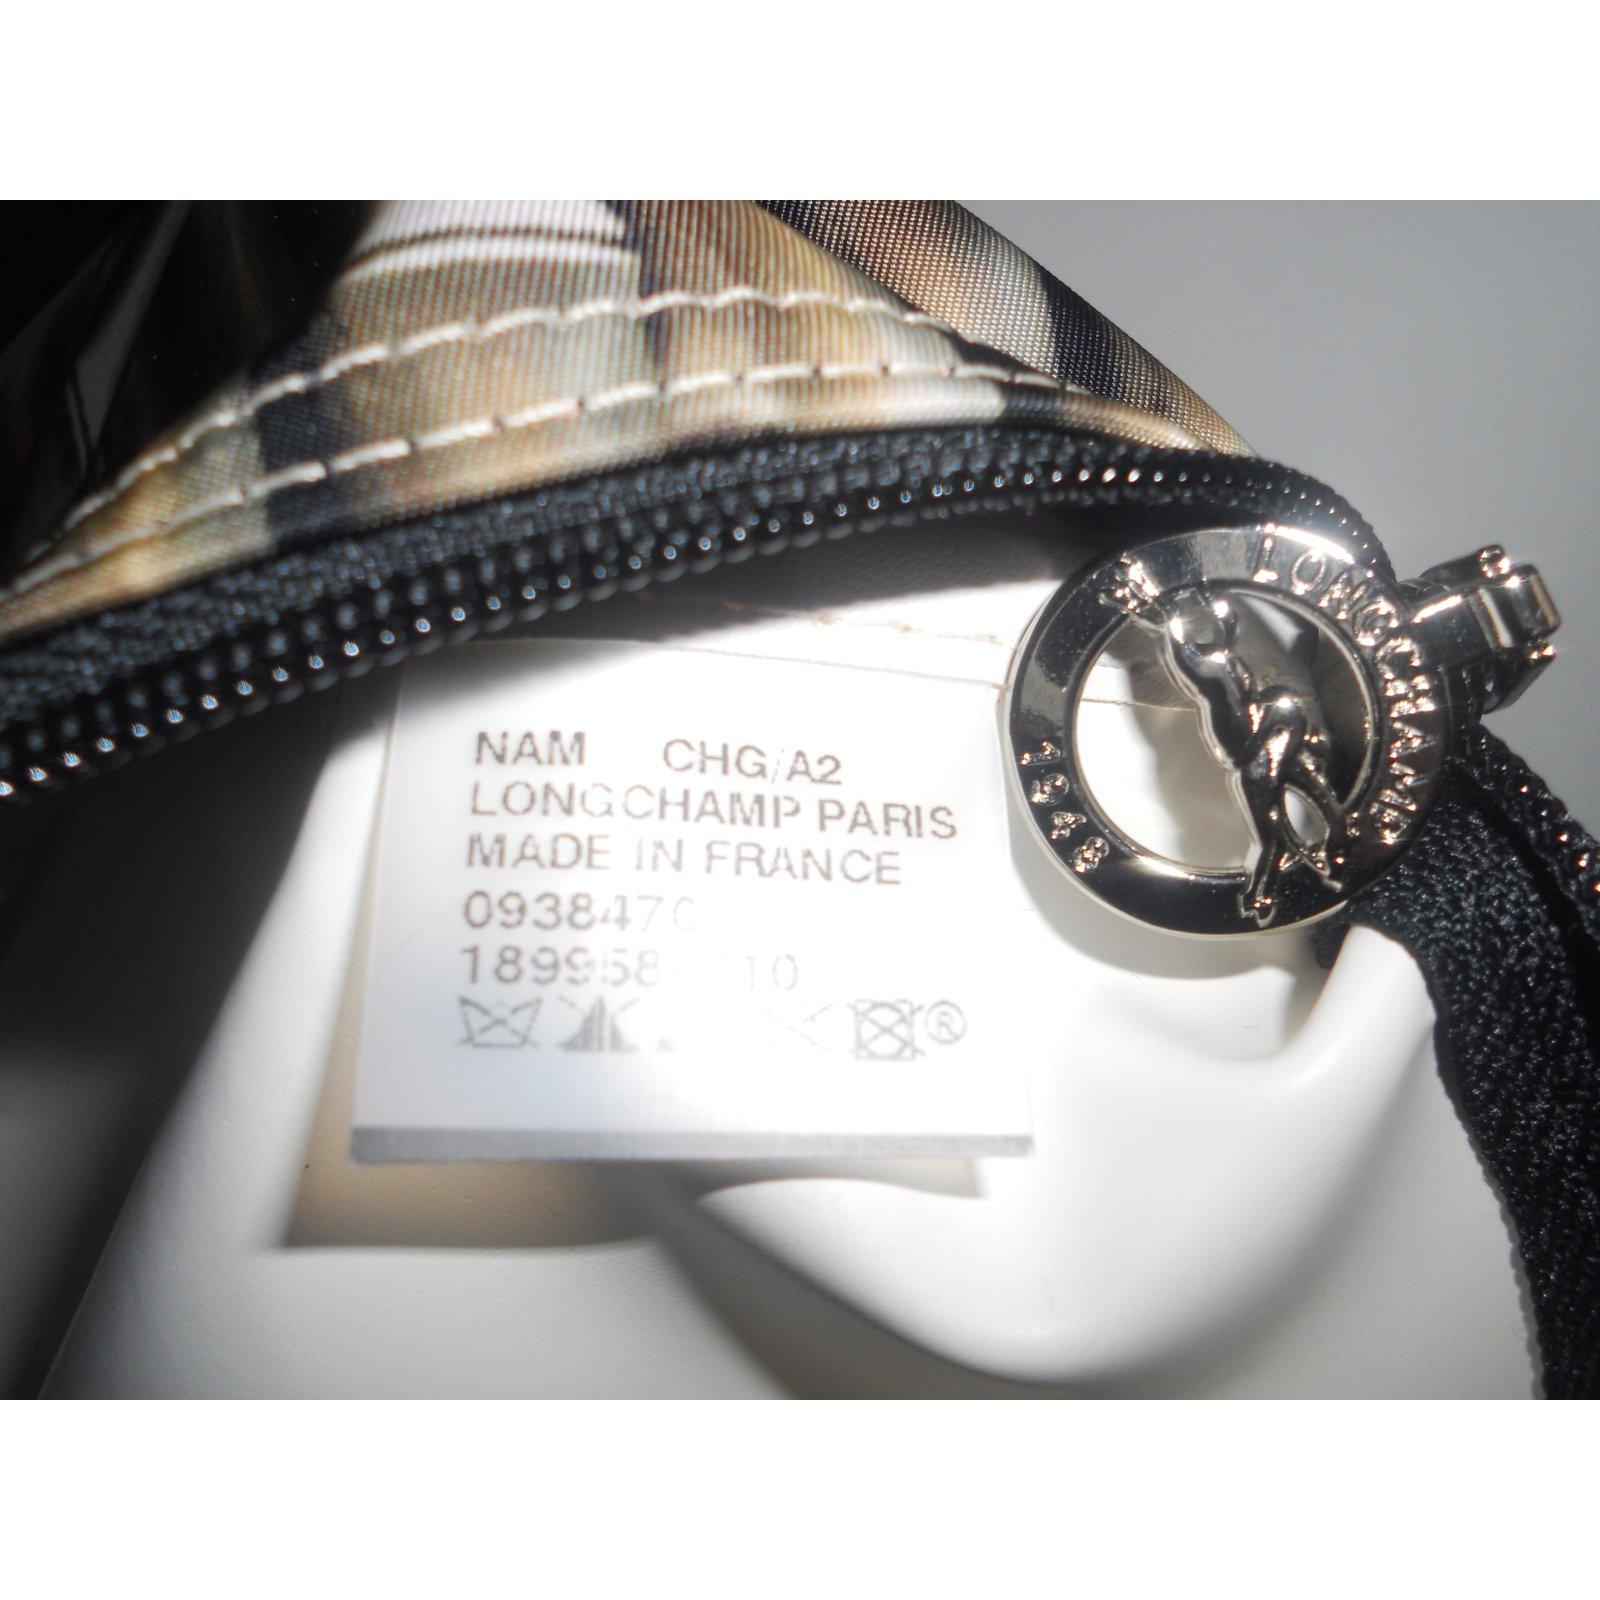 39483658925f Longchamp Handbags Handbags Leather Multiple colors ref.44851 - Joli Closet